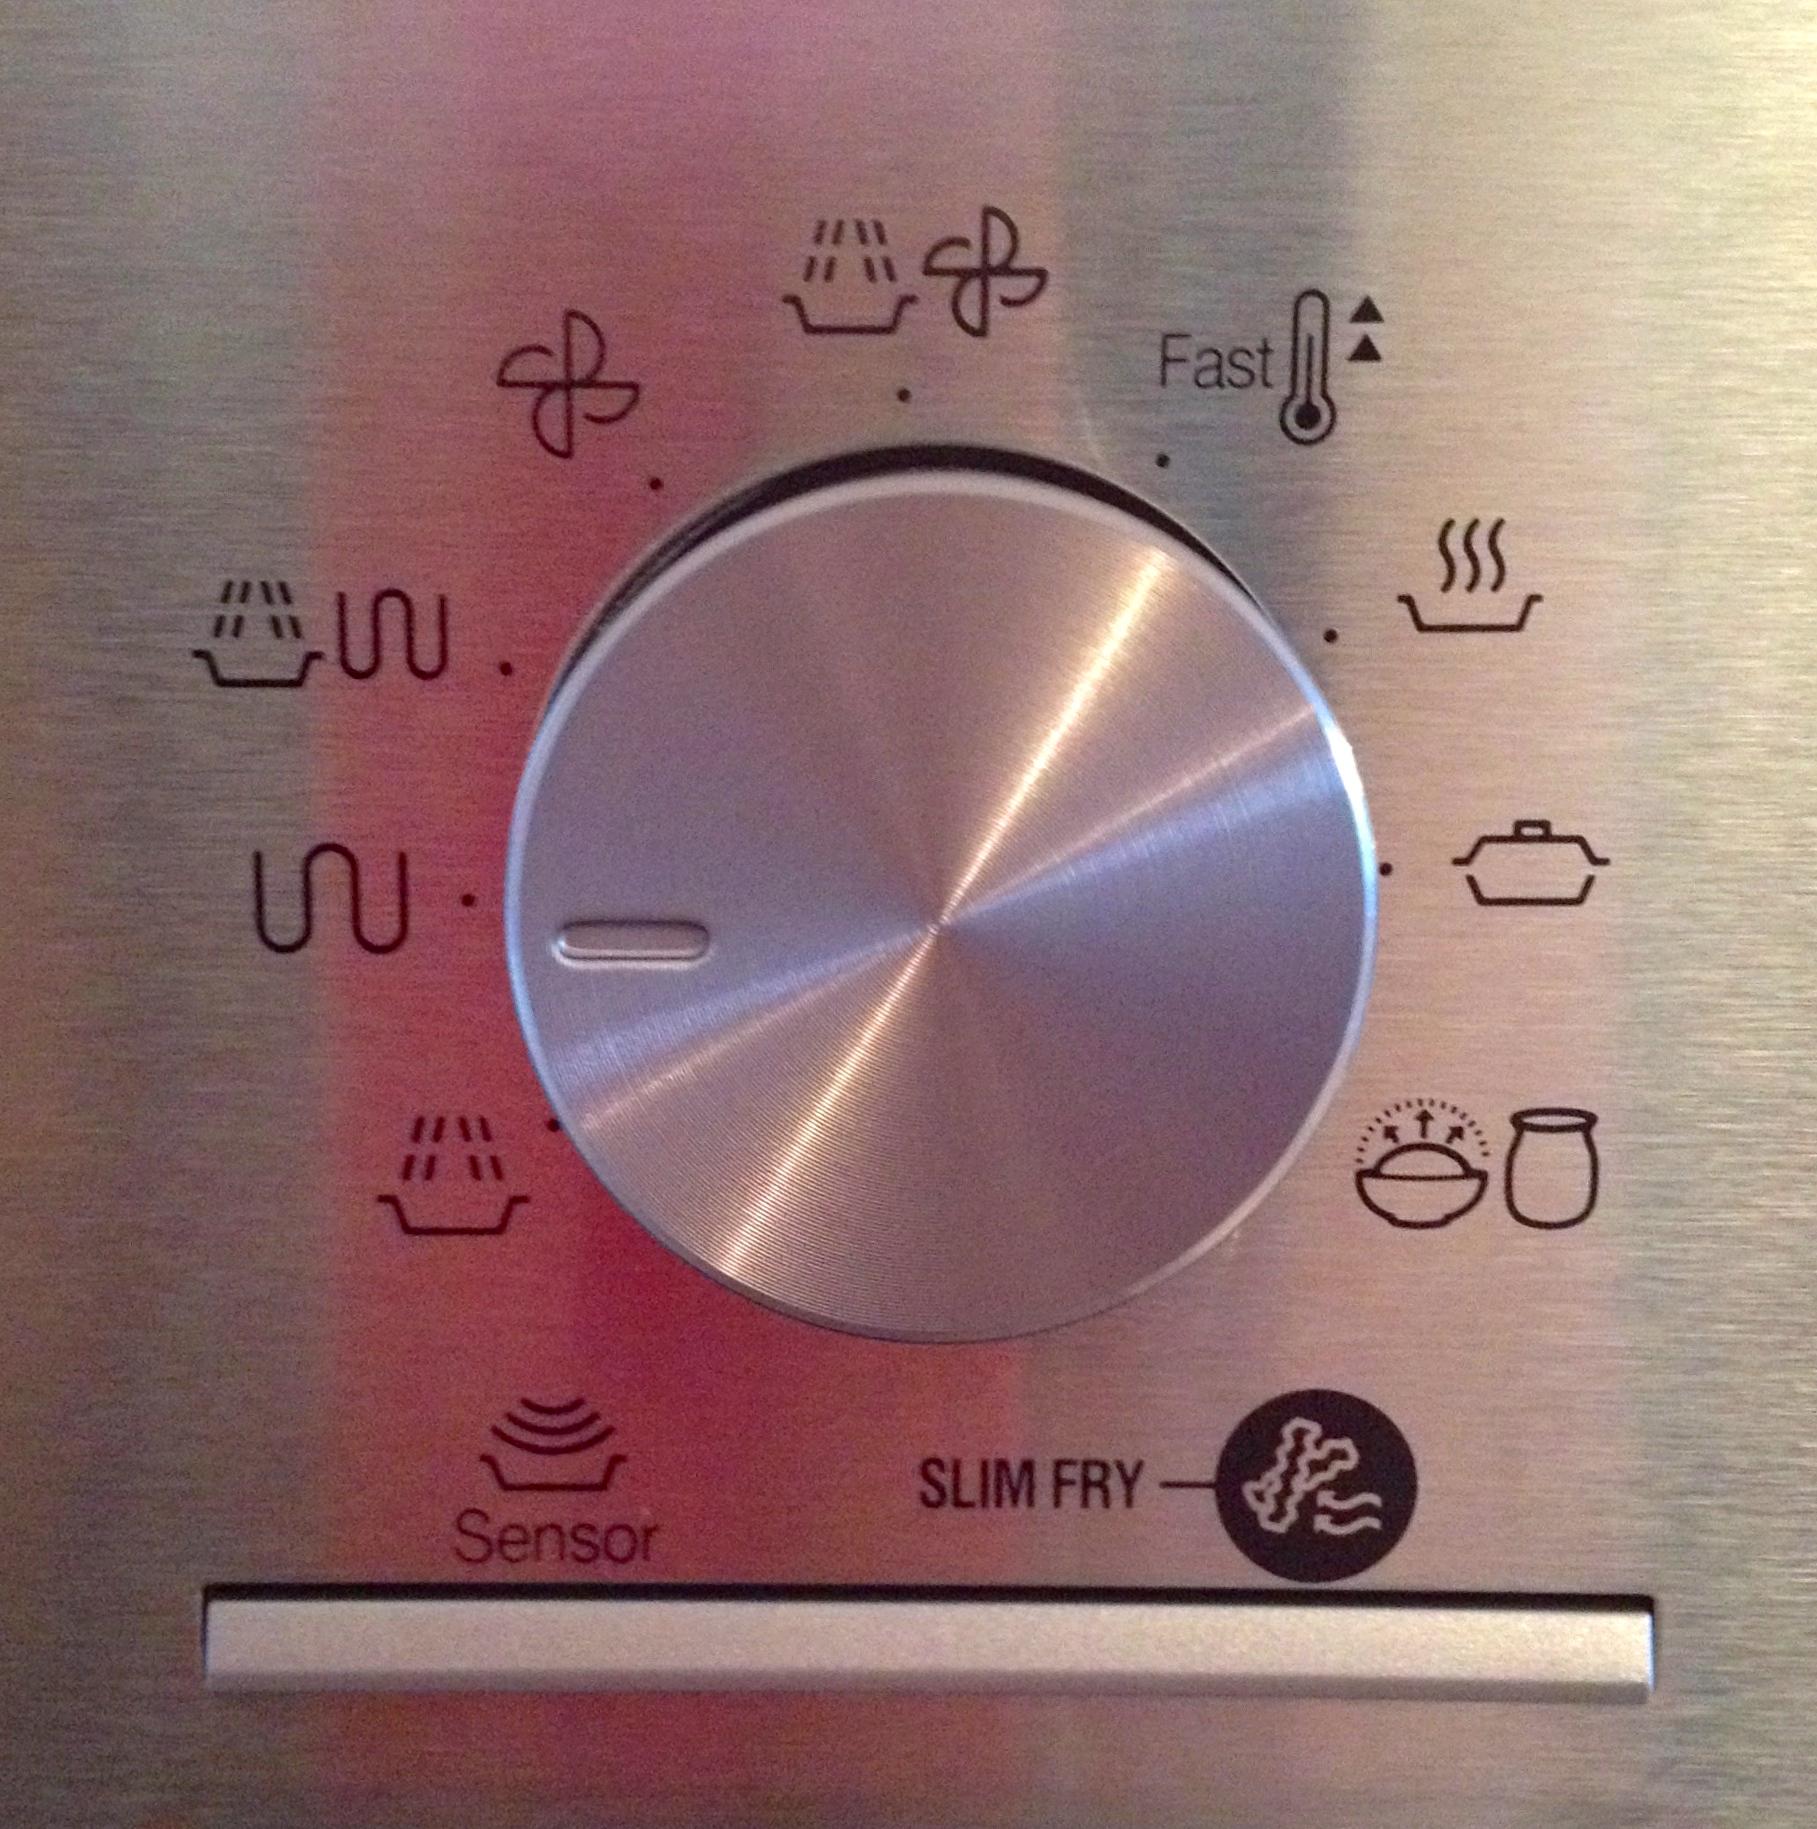 Deciphering european hieroglyphs or how to use a microwave in european microwave knob expatlingo biocorpaavc Choice Image